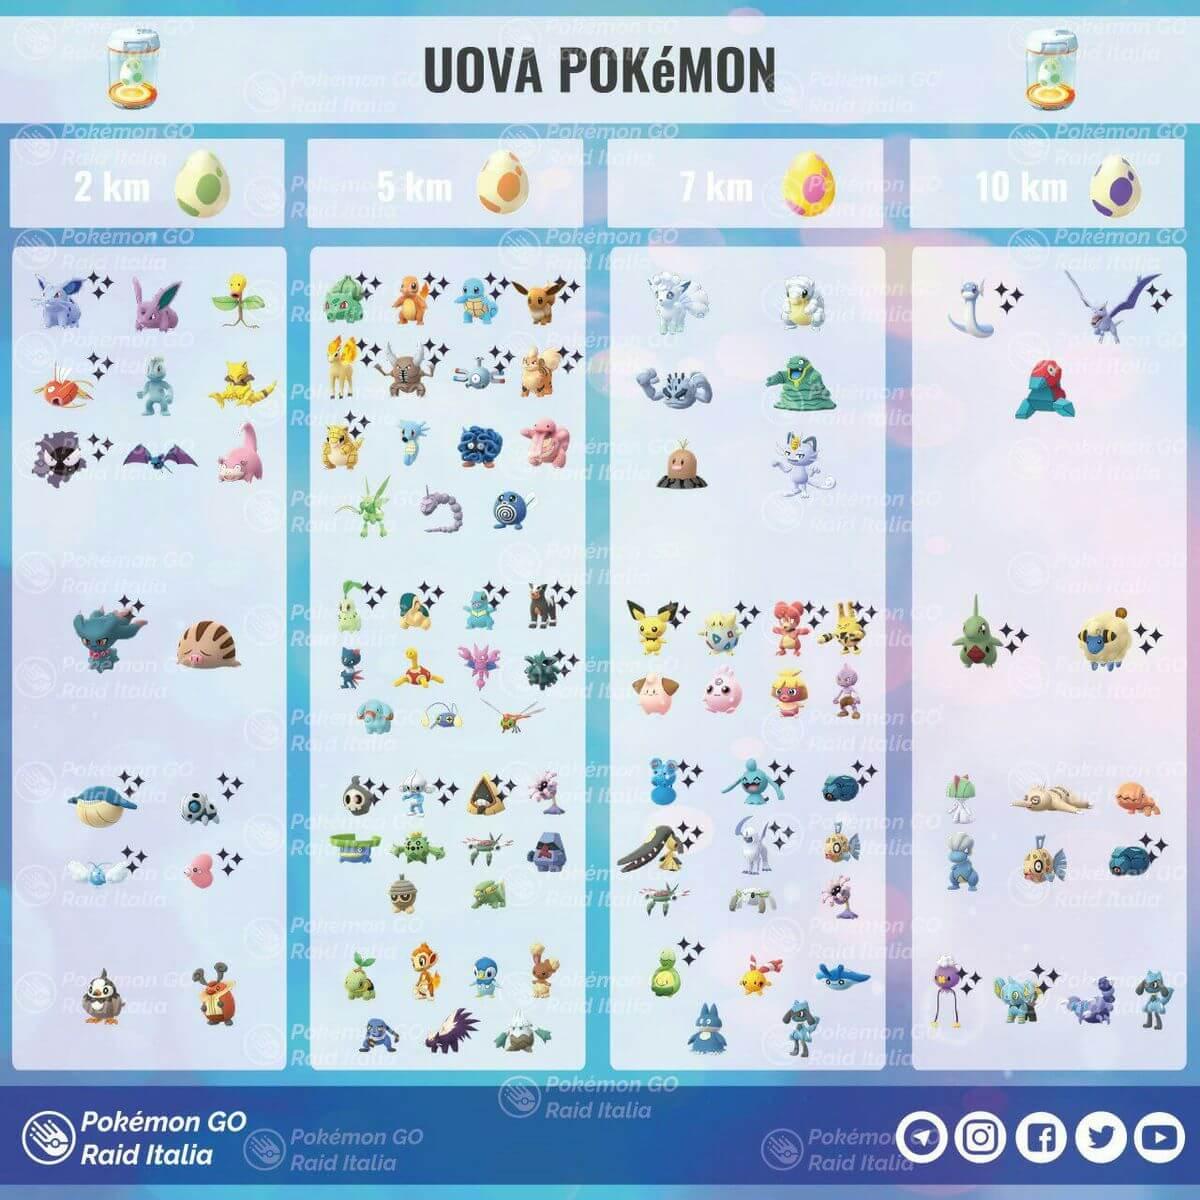 Все яйца в Pokemon GO: 2, 5, 7, 10 км